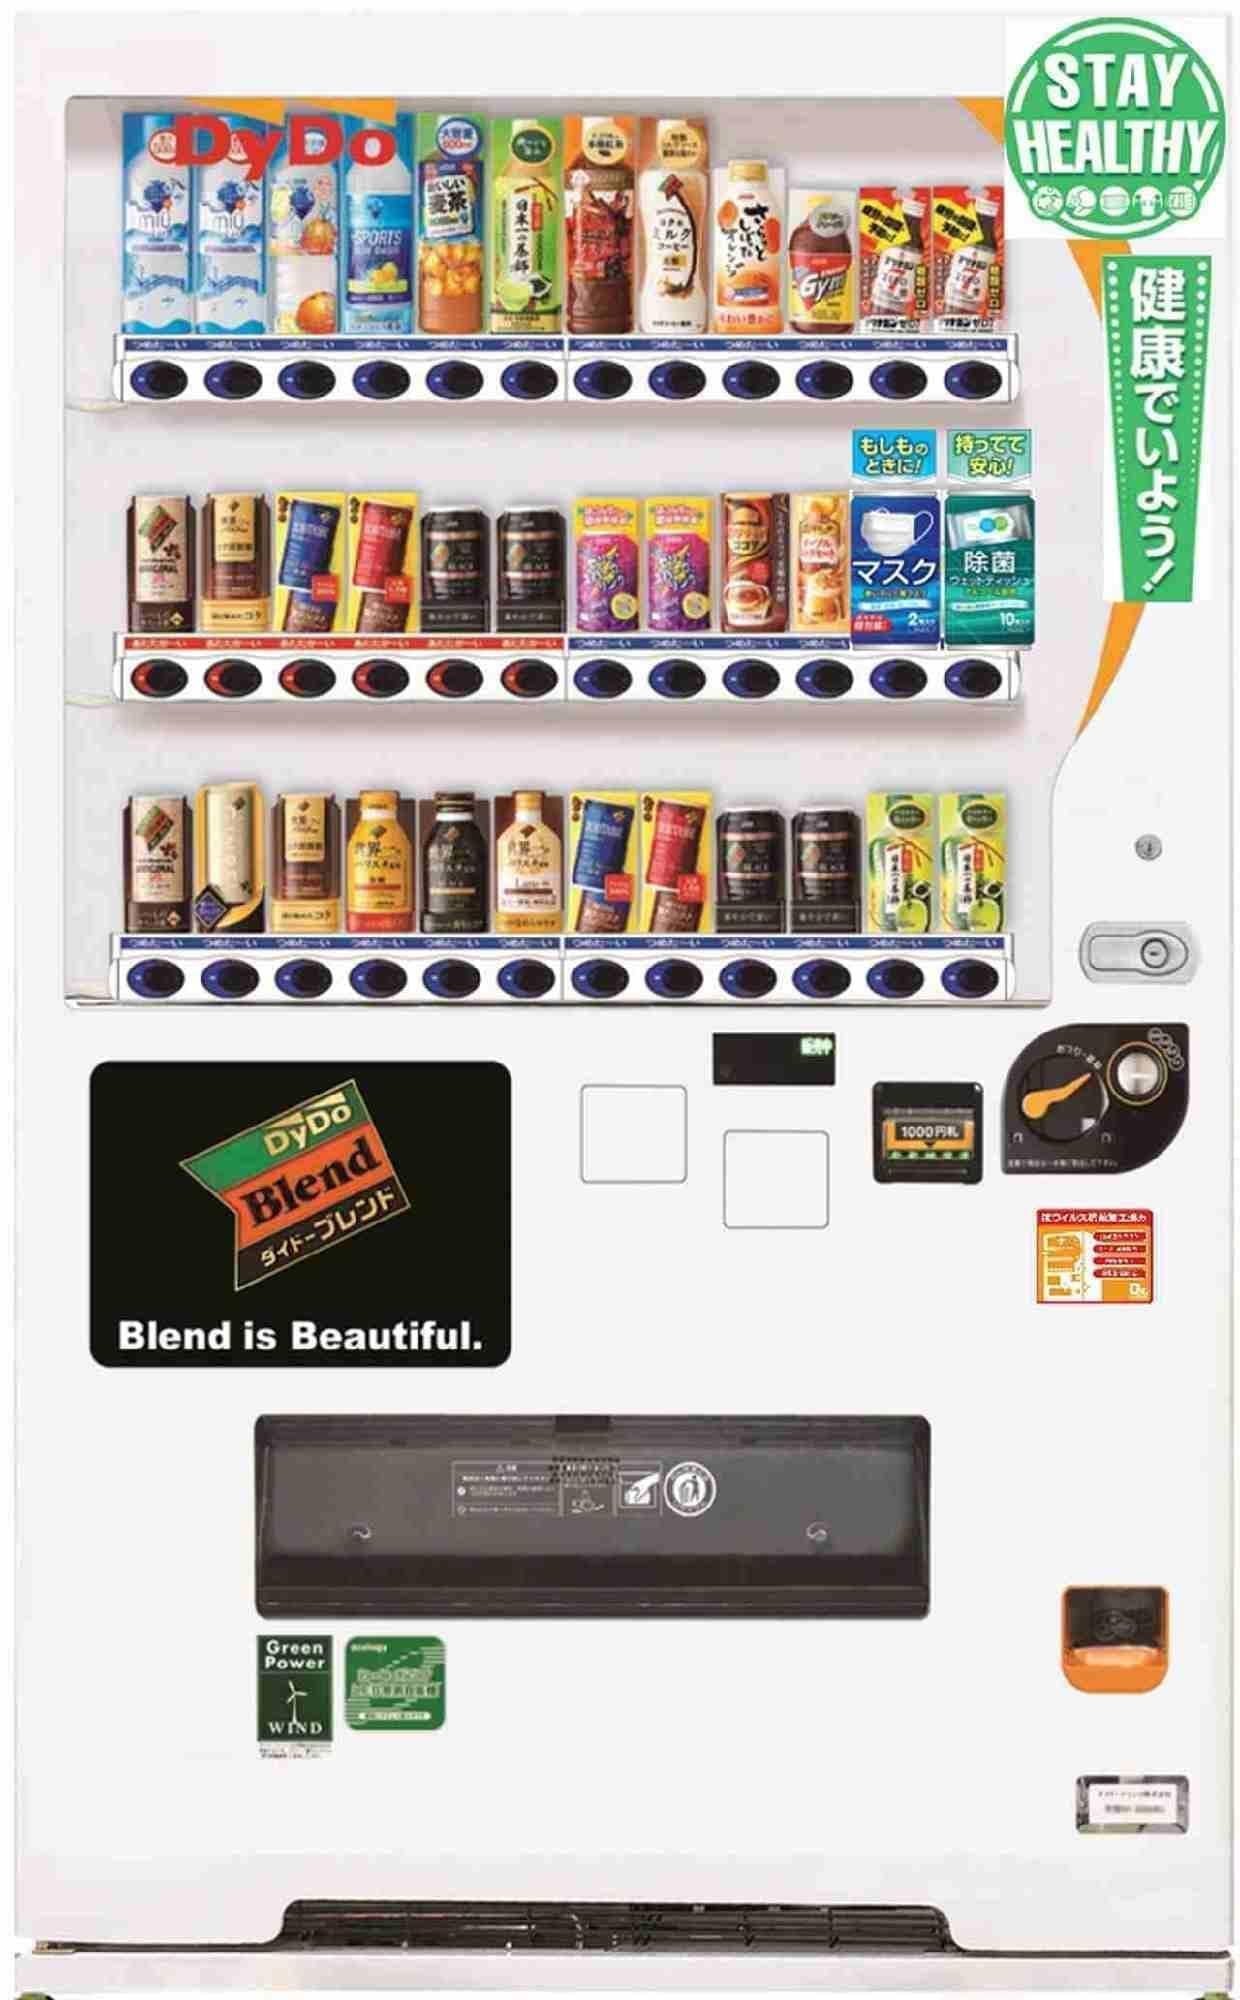 Japanese-vending-mchine-DyDo-masks-antibac-wipes-new-coronavirus-COVID-19-Japan-news-top.jpg